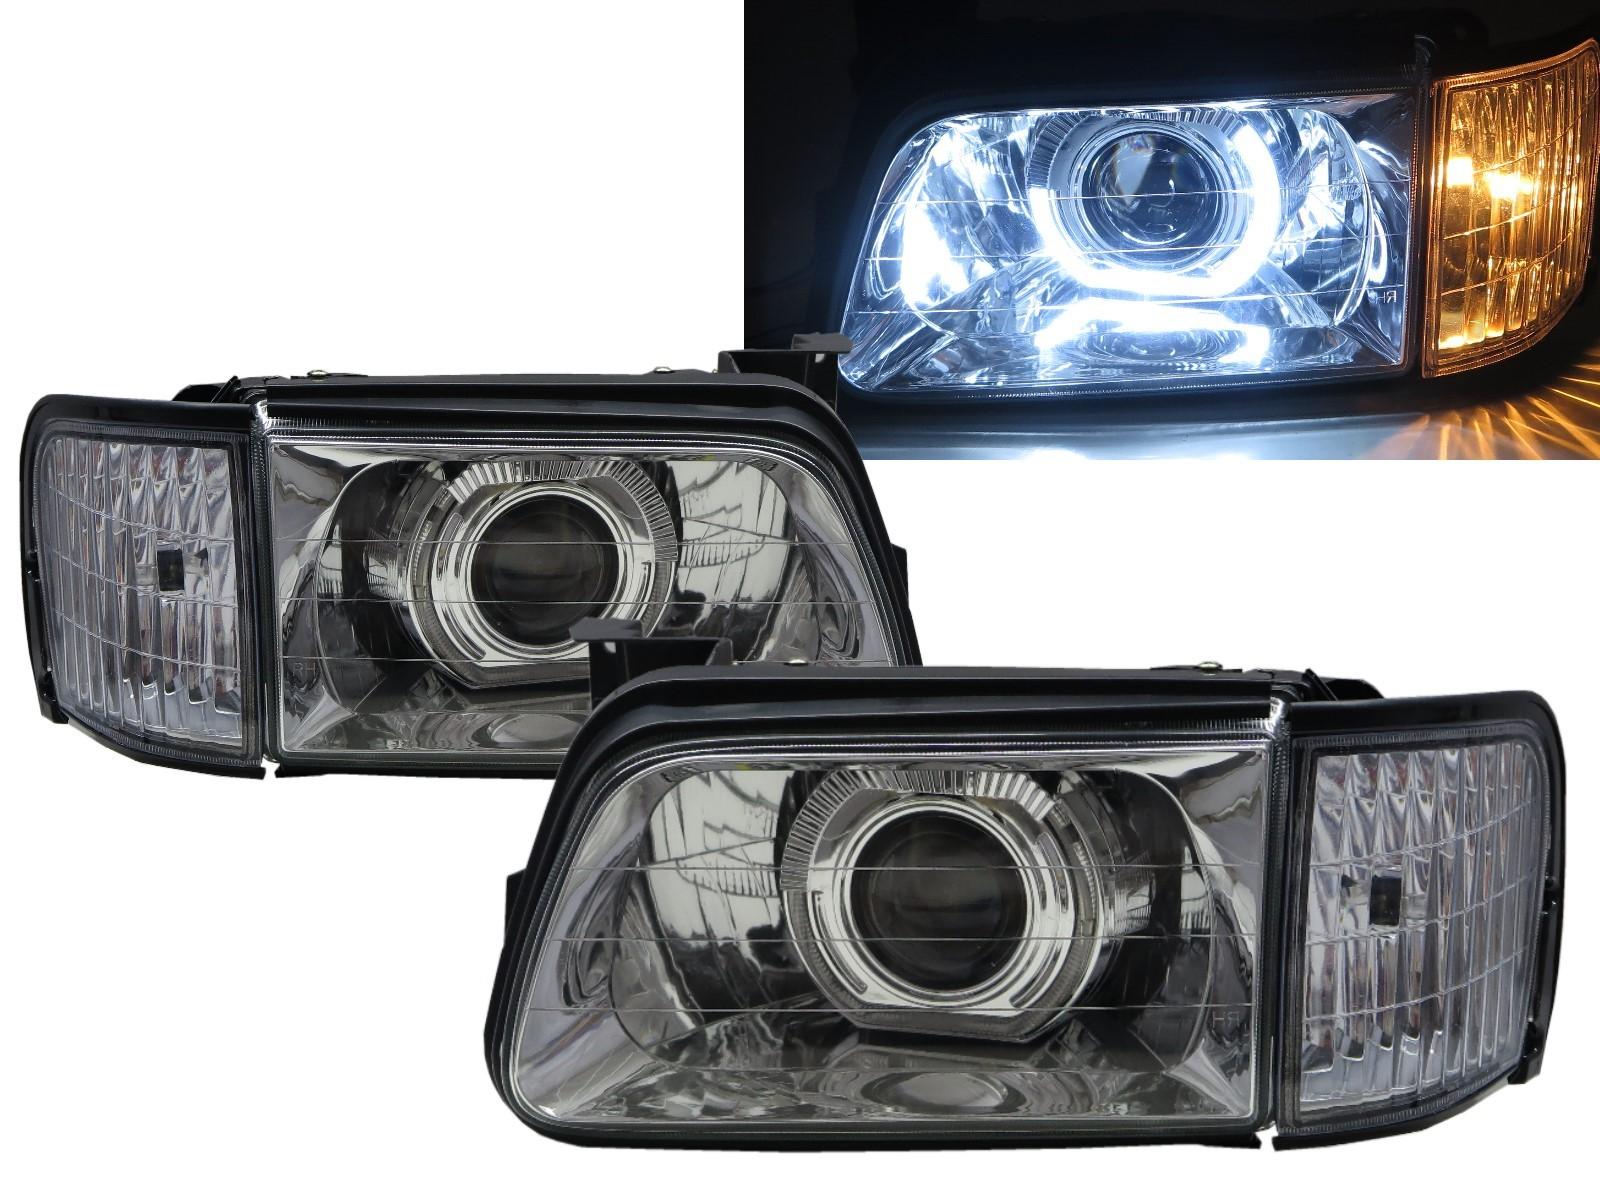 CrazyTheGod Tourmaster 1997-1998 Pickup 4D Guide LED Angel-Eye Projector W/ Corner Lamp Headlight Headlamp Chrome for HONDA RHD